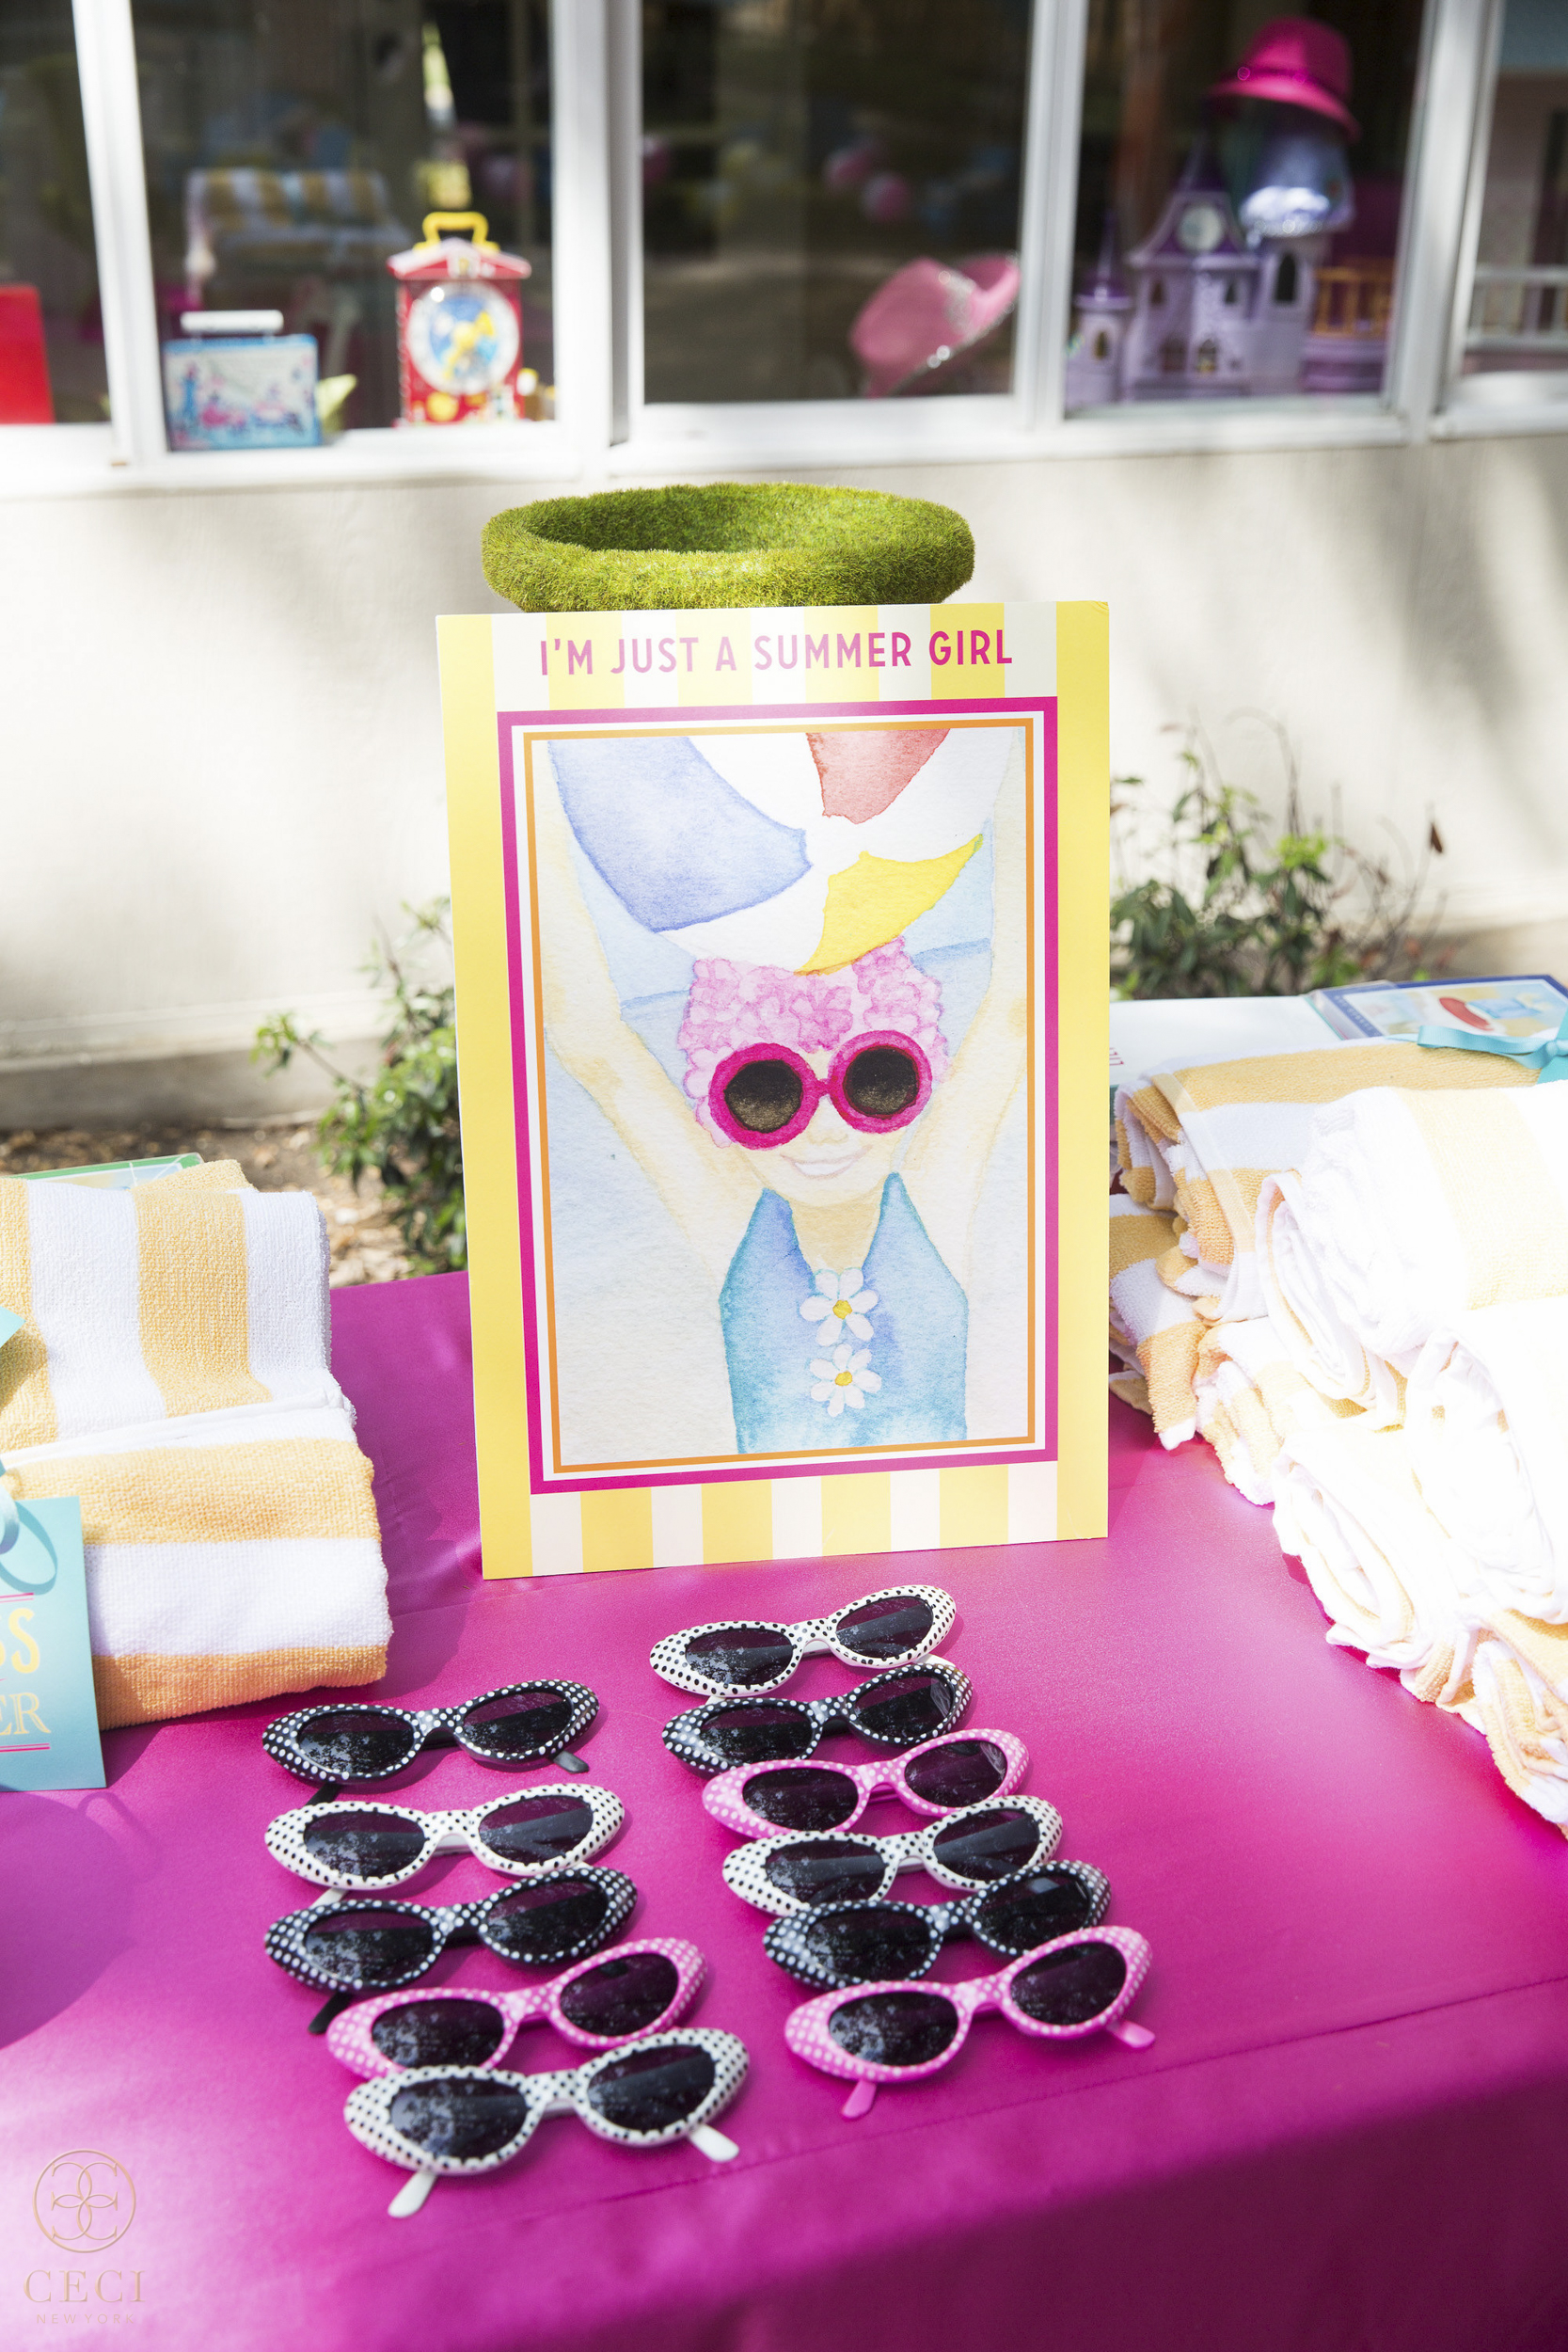 dallas_texas_birthday_party_mae_emily_clarke_events_kids_retro_pool_swim_endless_summer_invitations_ceci_new_york_invitations_watercolor_illustration_decor-10.jpg